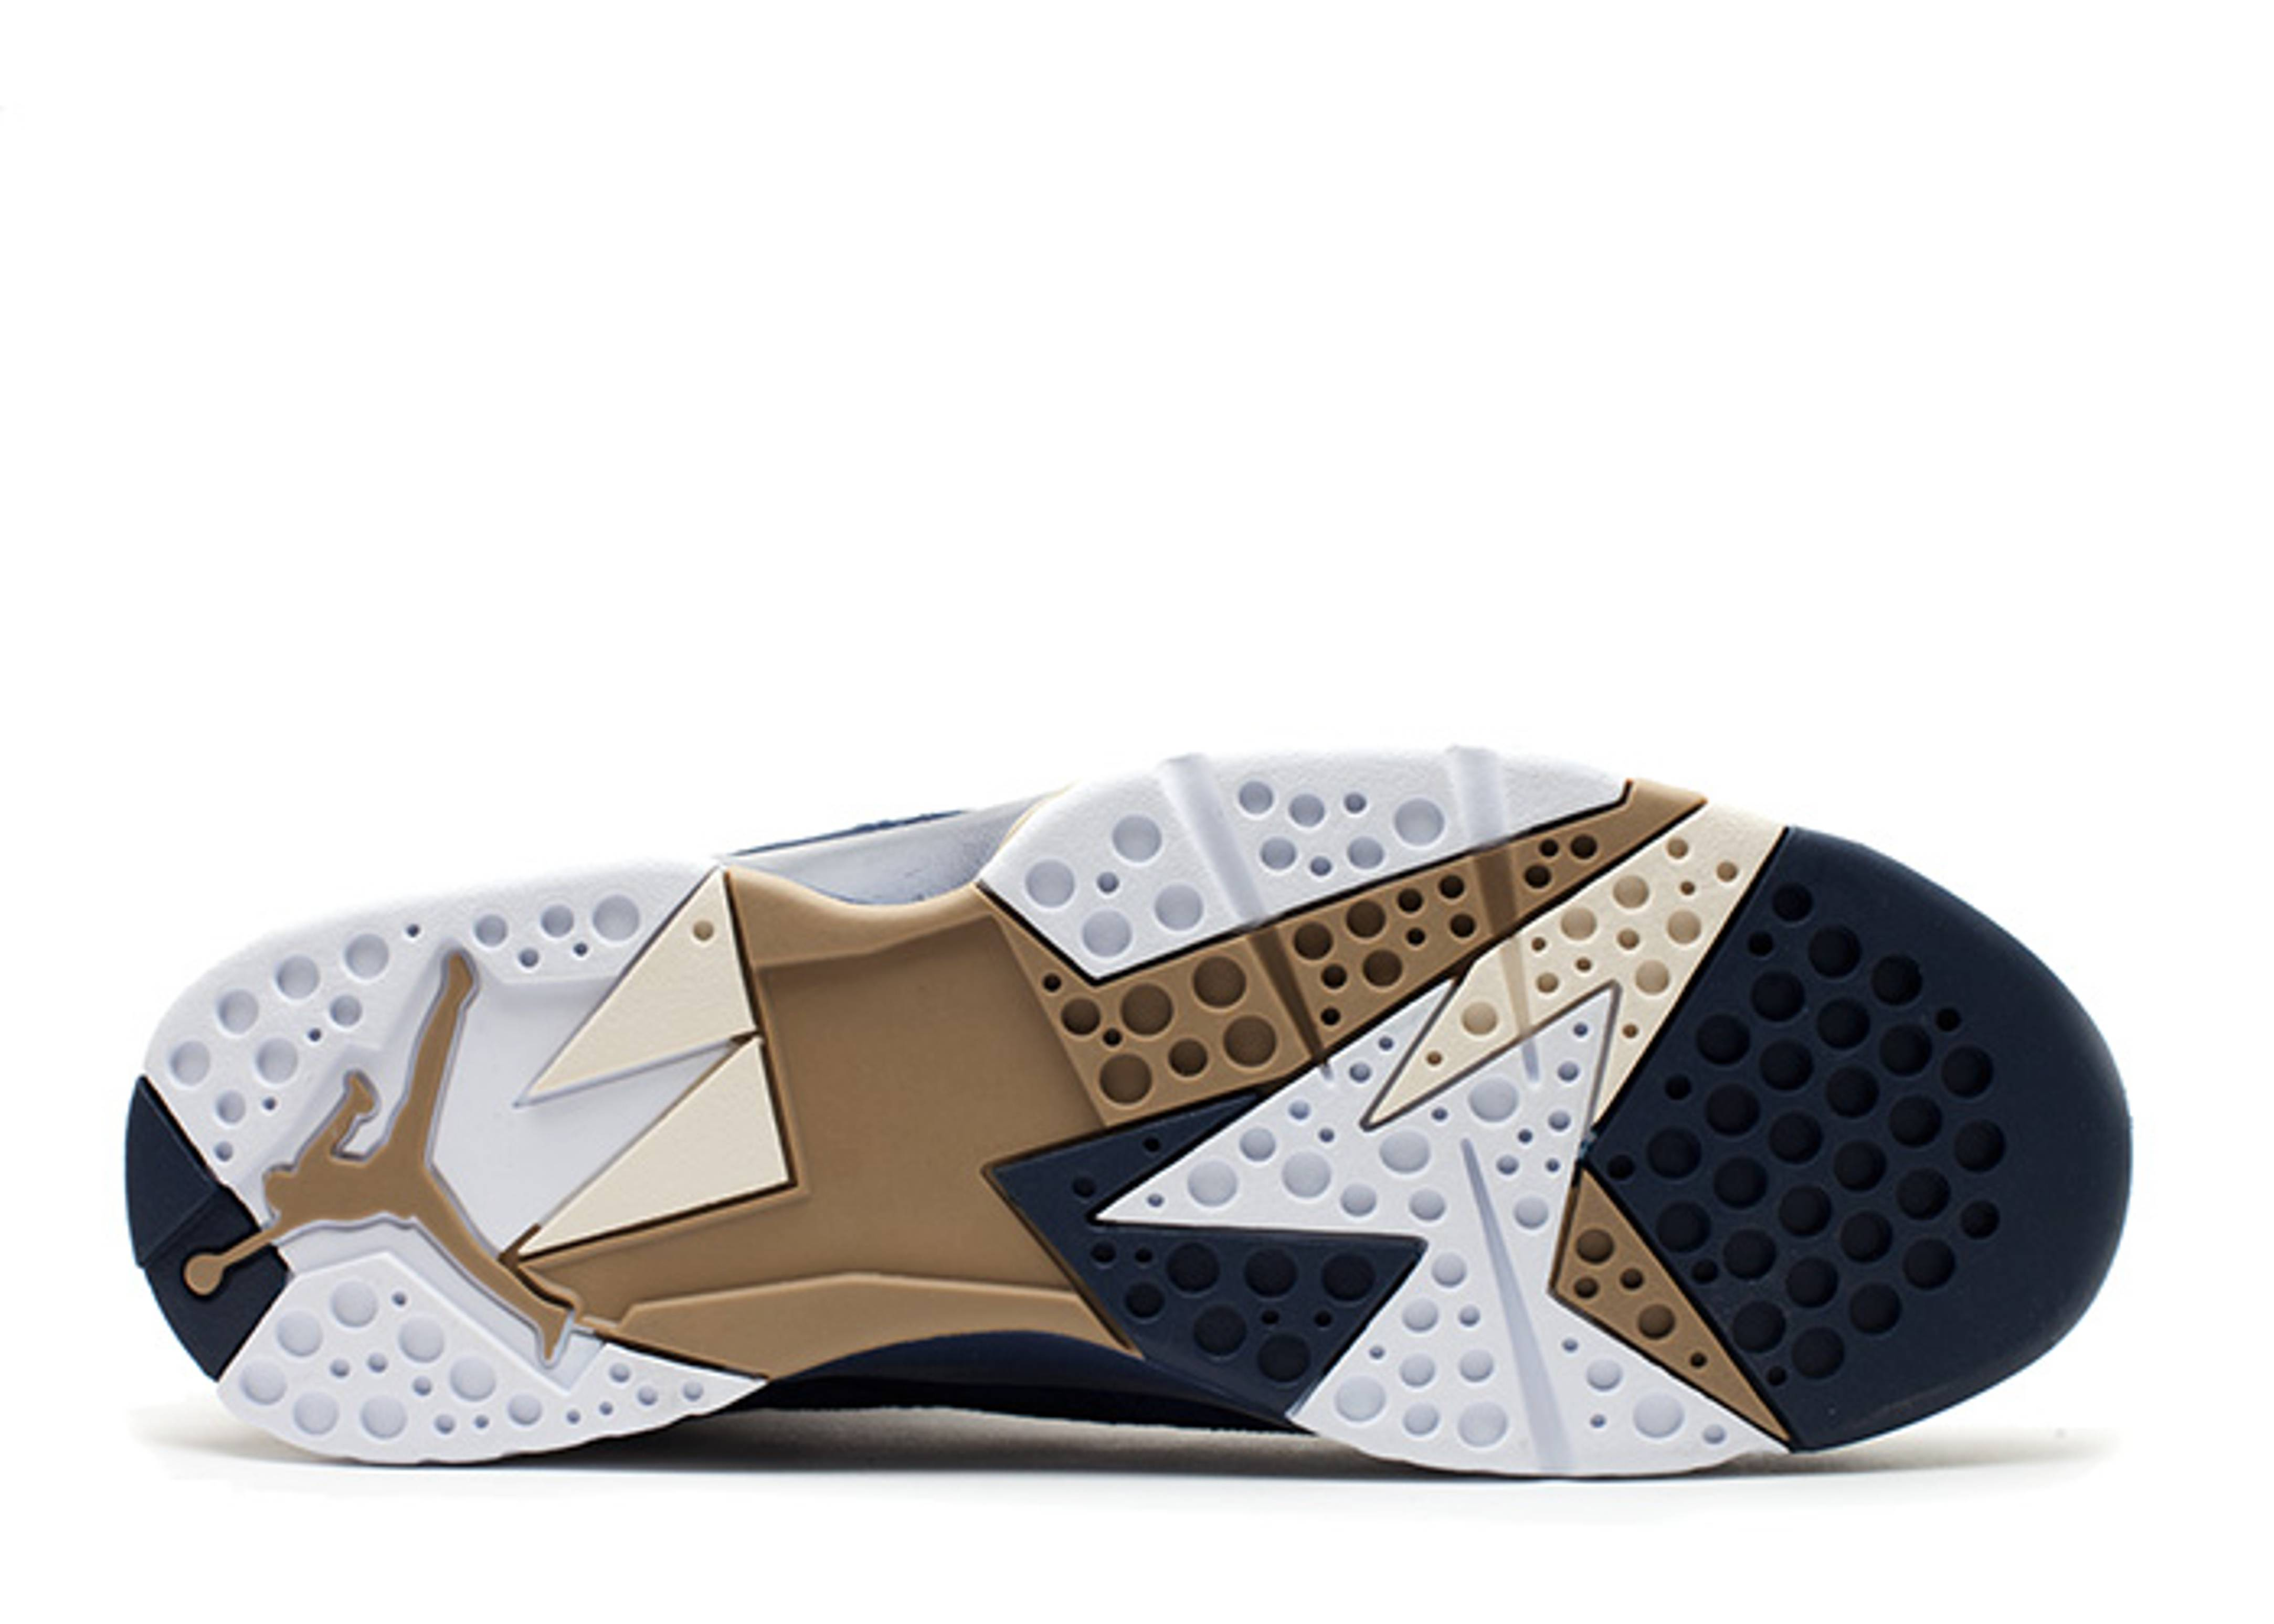 sale retailer 5f9be 7a7fc Air Jordan 7 Retro J2k